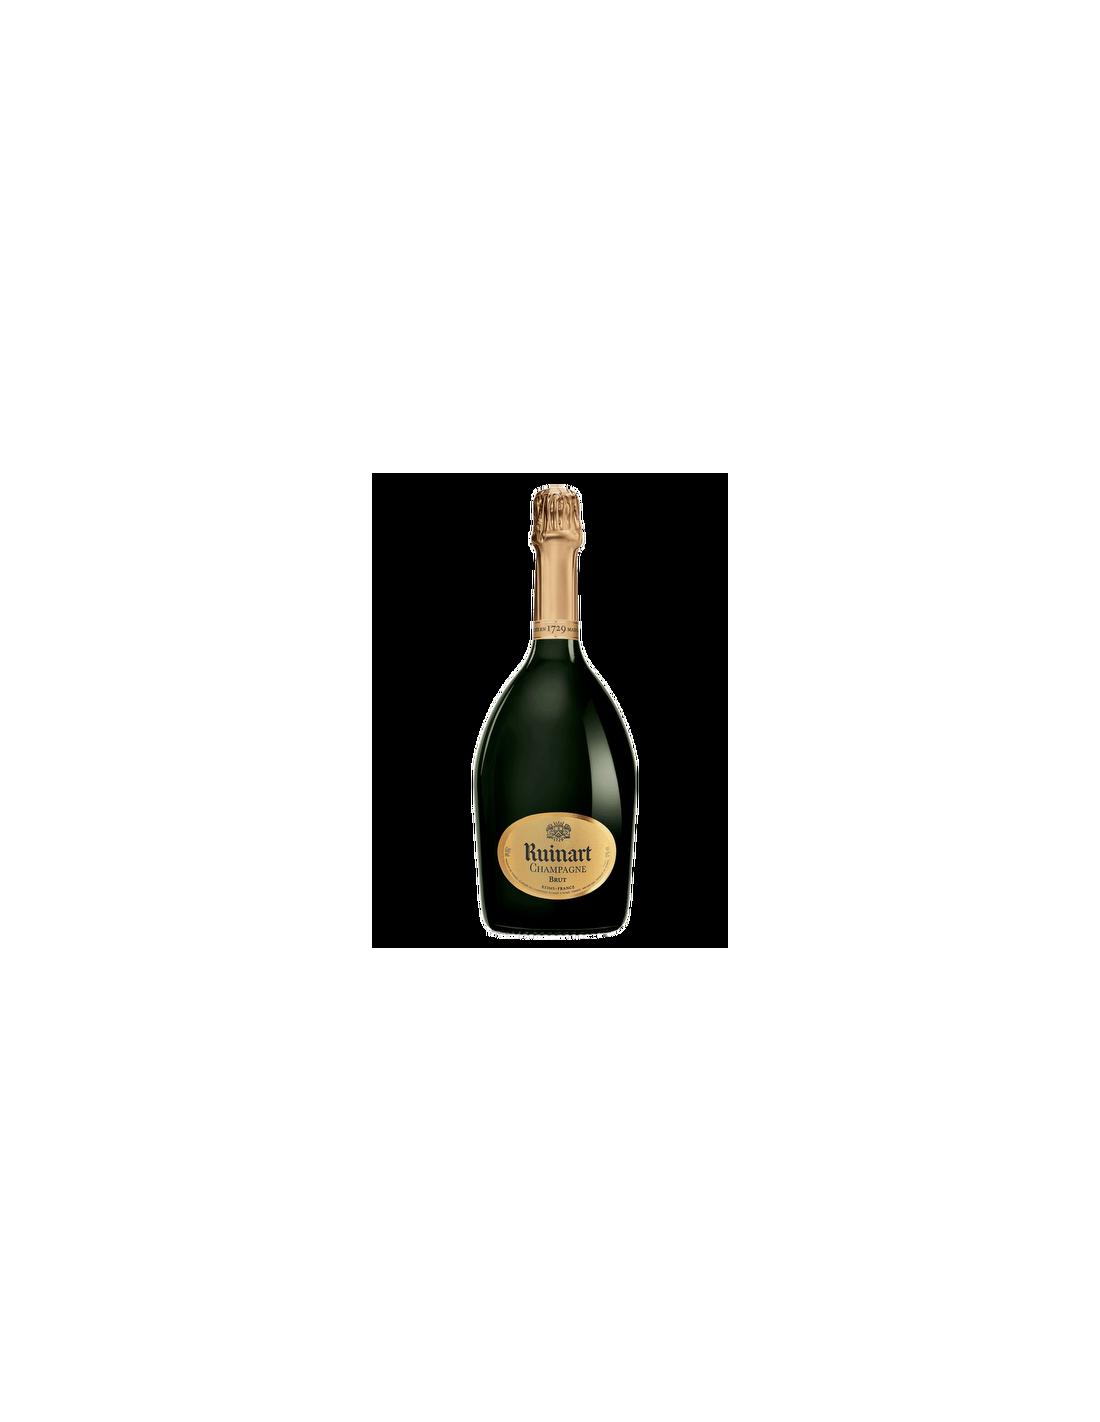 Sampanie, Ruinart Champagne, 0.75L, 12% alc., Franta